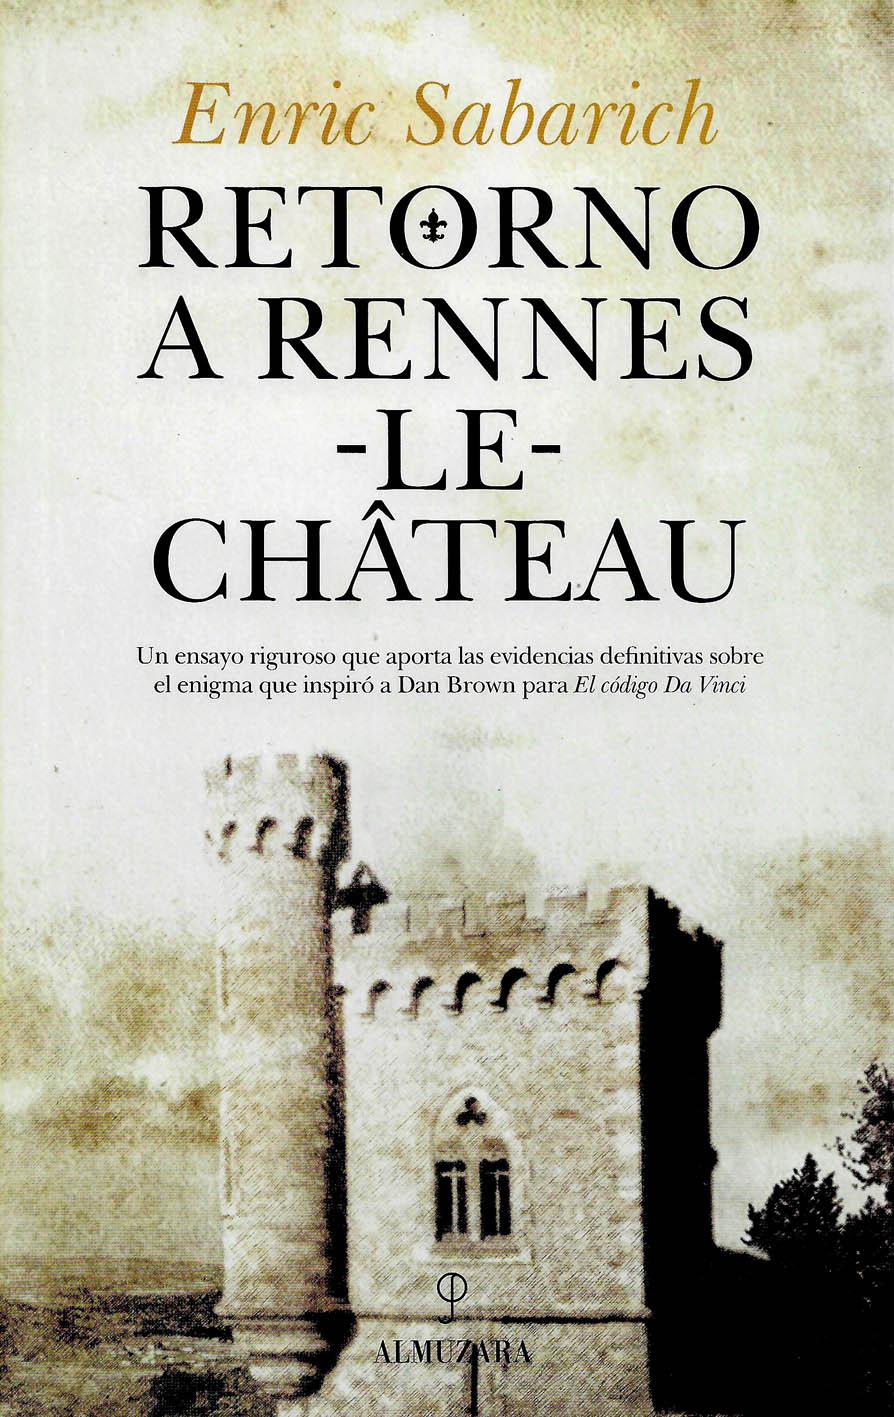 RETORNO A RENNES-LE-CHÂTEAU Enric Sabarich